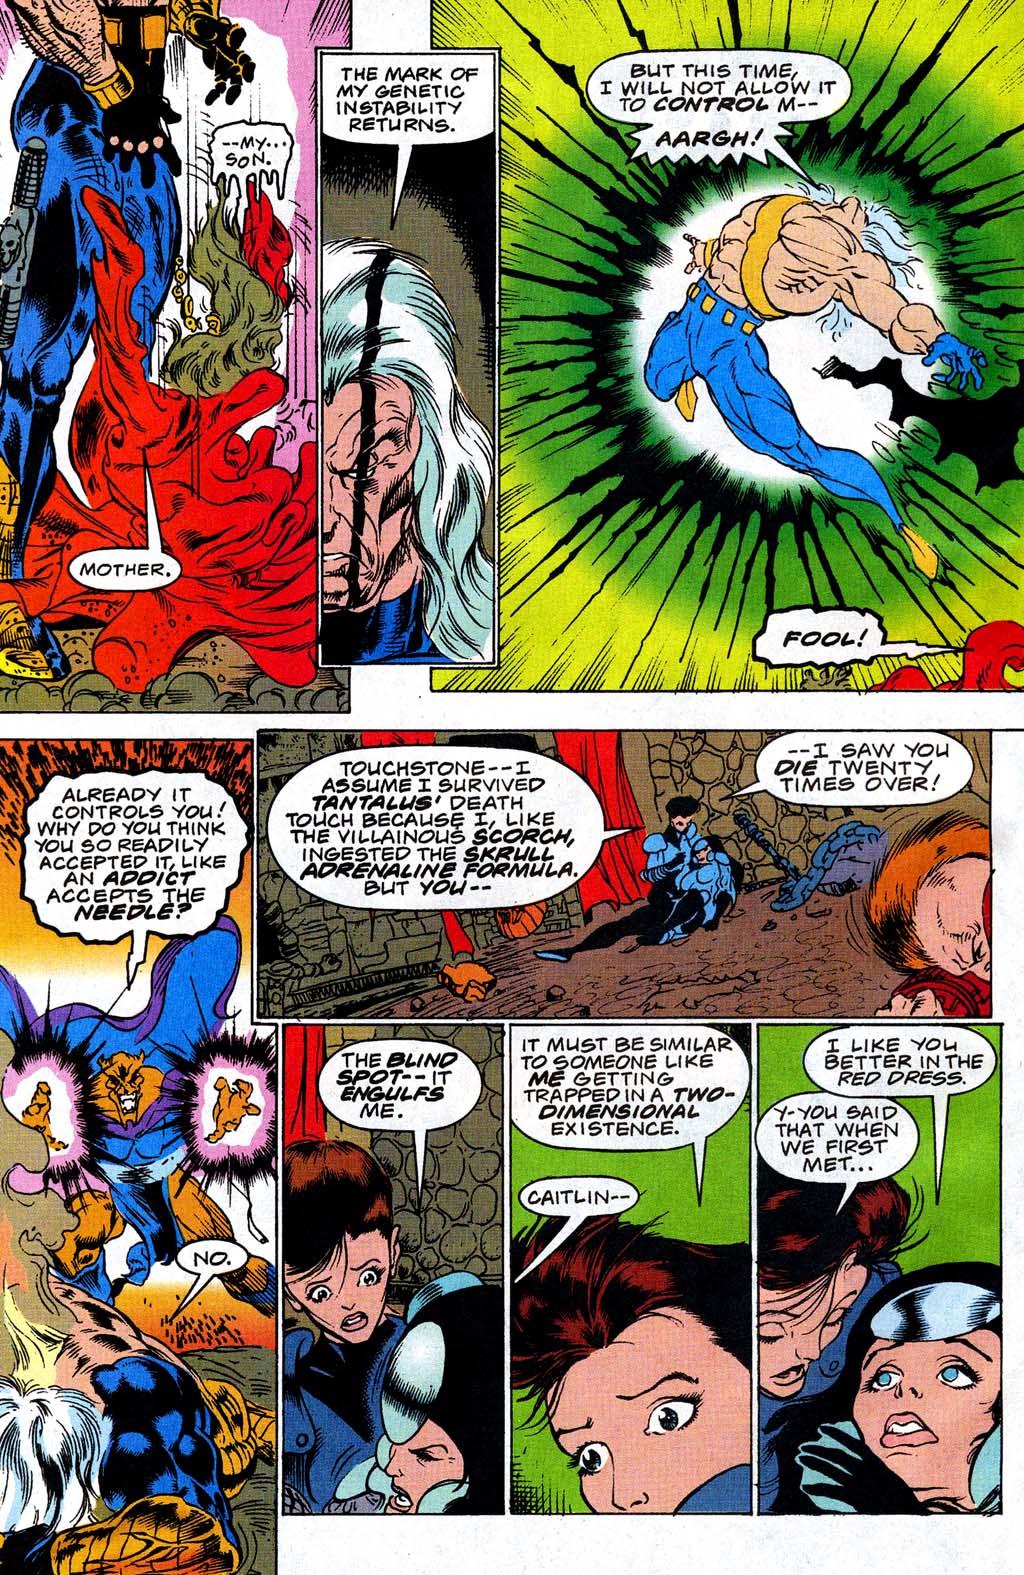 Read online Blackwulf comic -  Issue #10 - 14